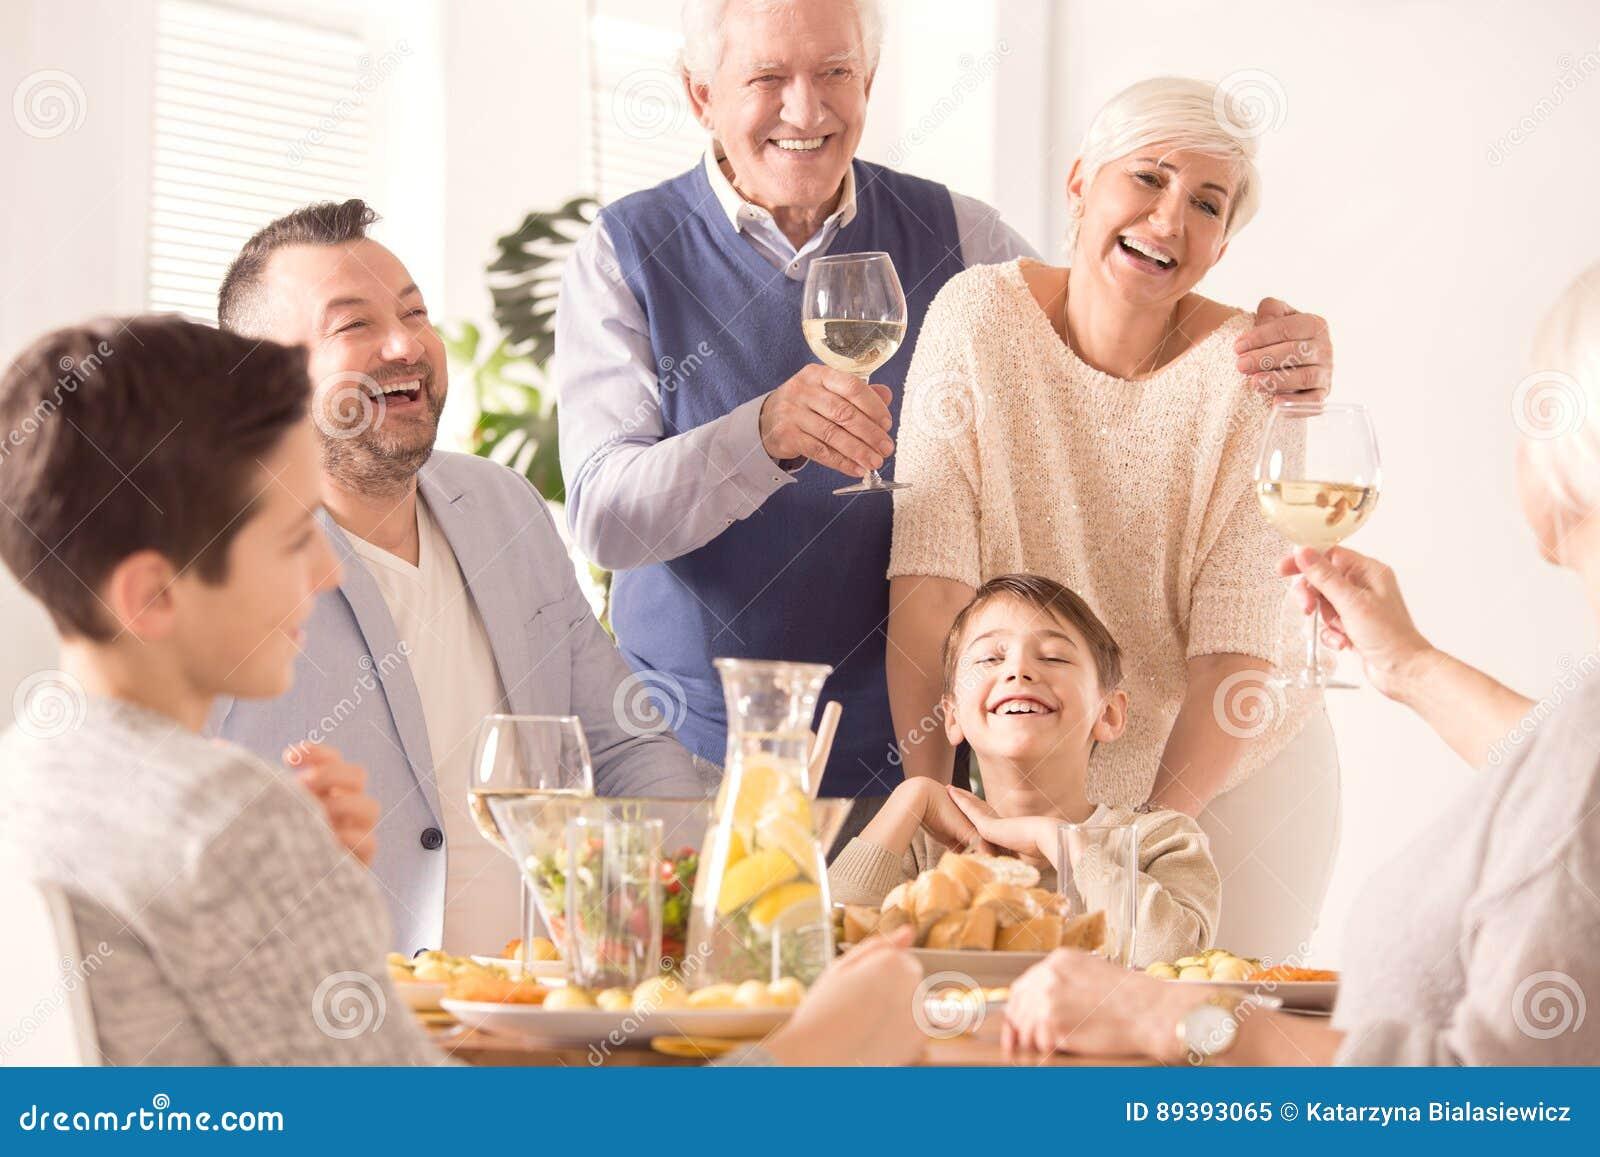 Family celebrating anniversary